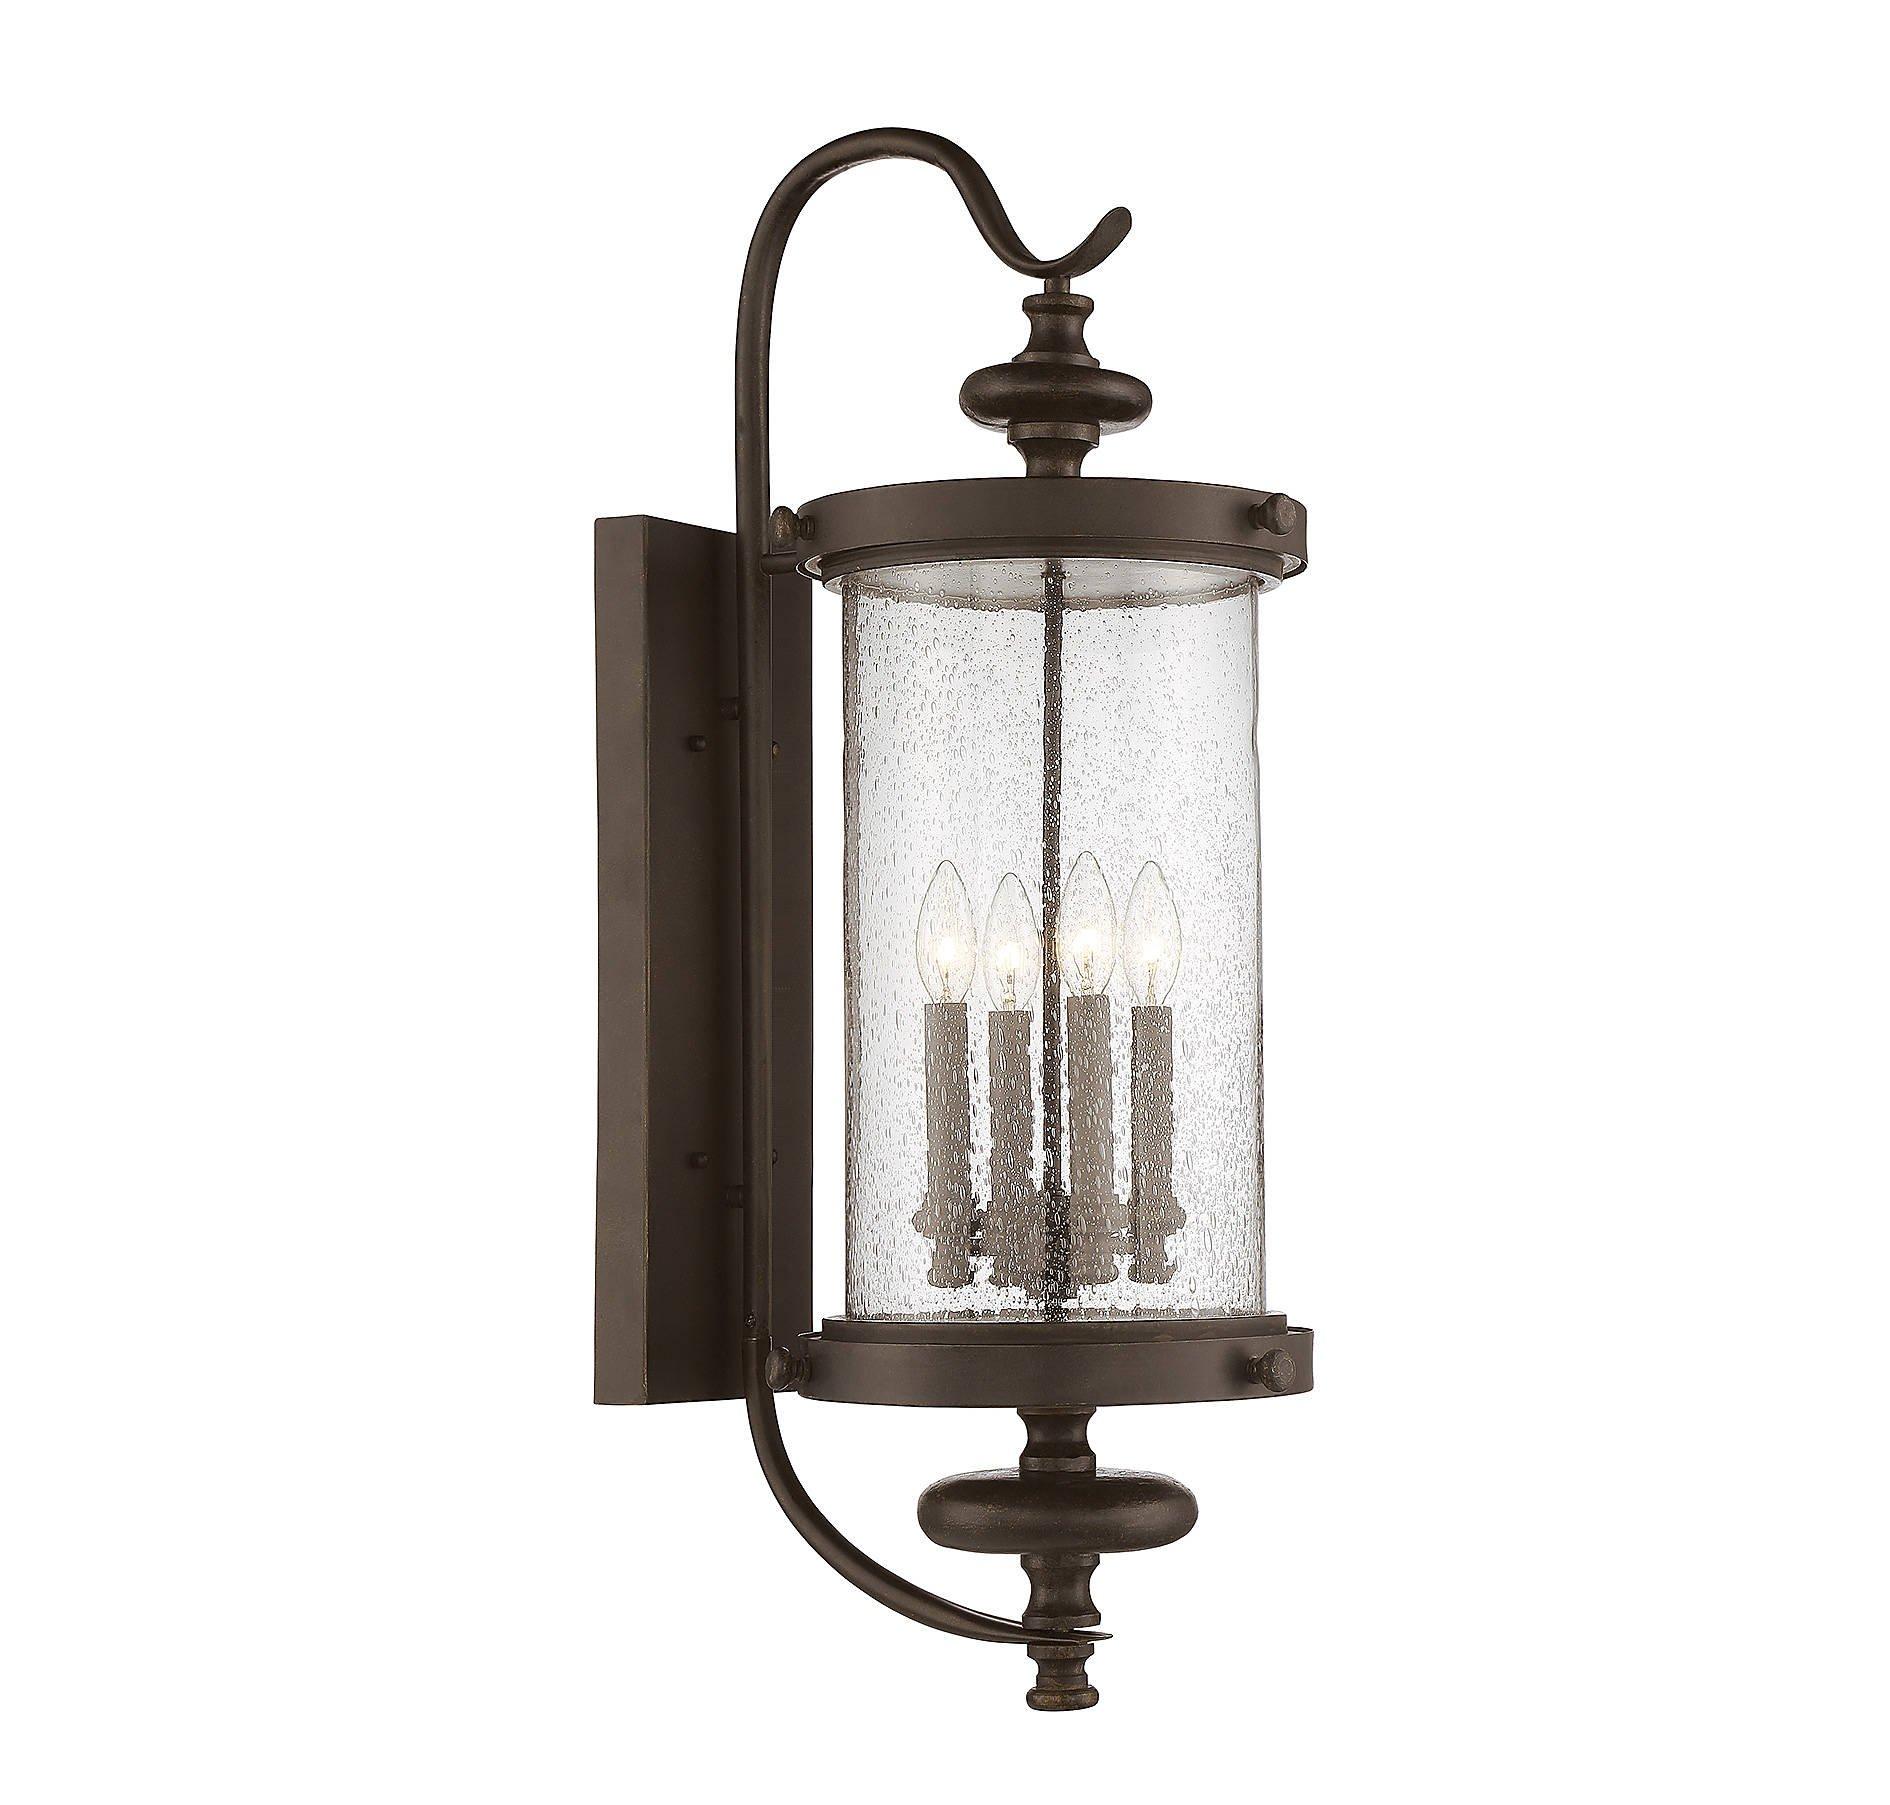 Savoy House 5-1224-40 Four Light Wall Lantern in Walnut Patina